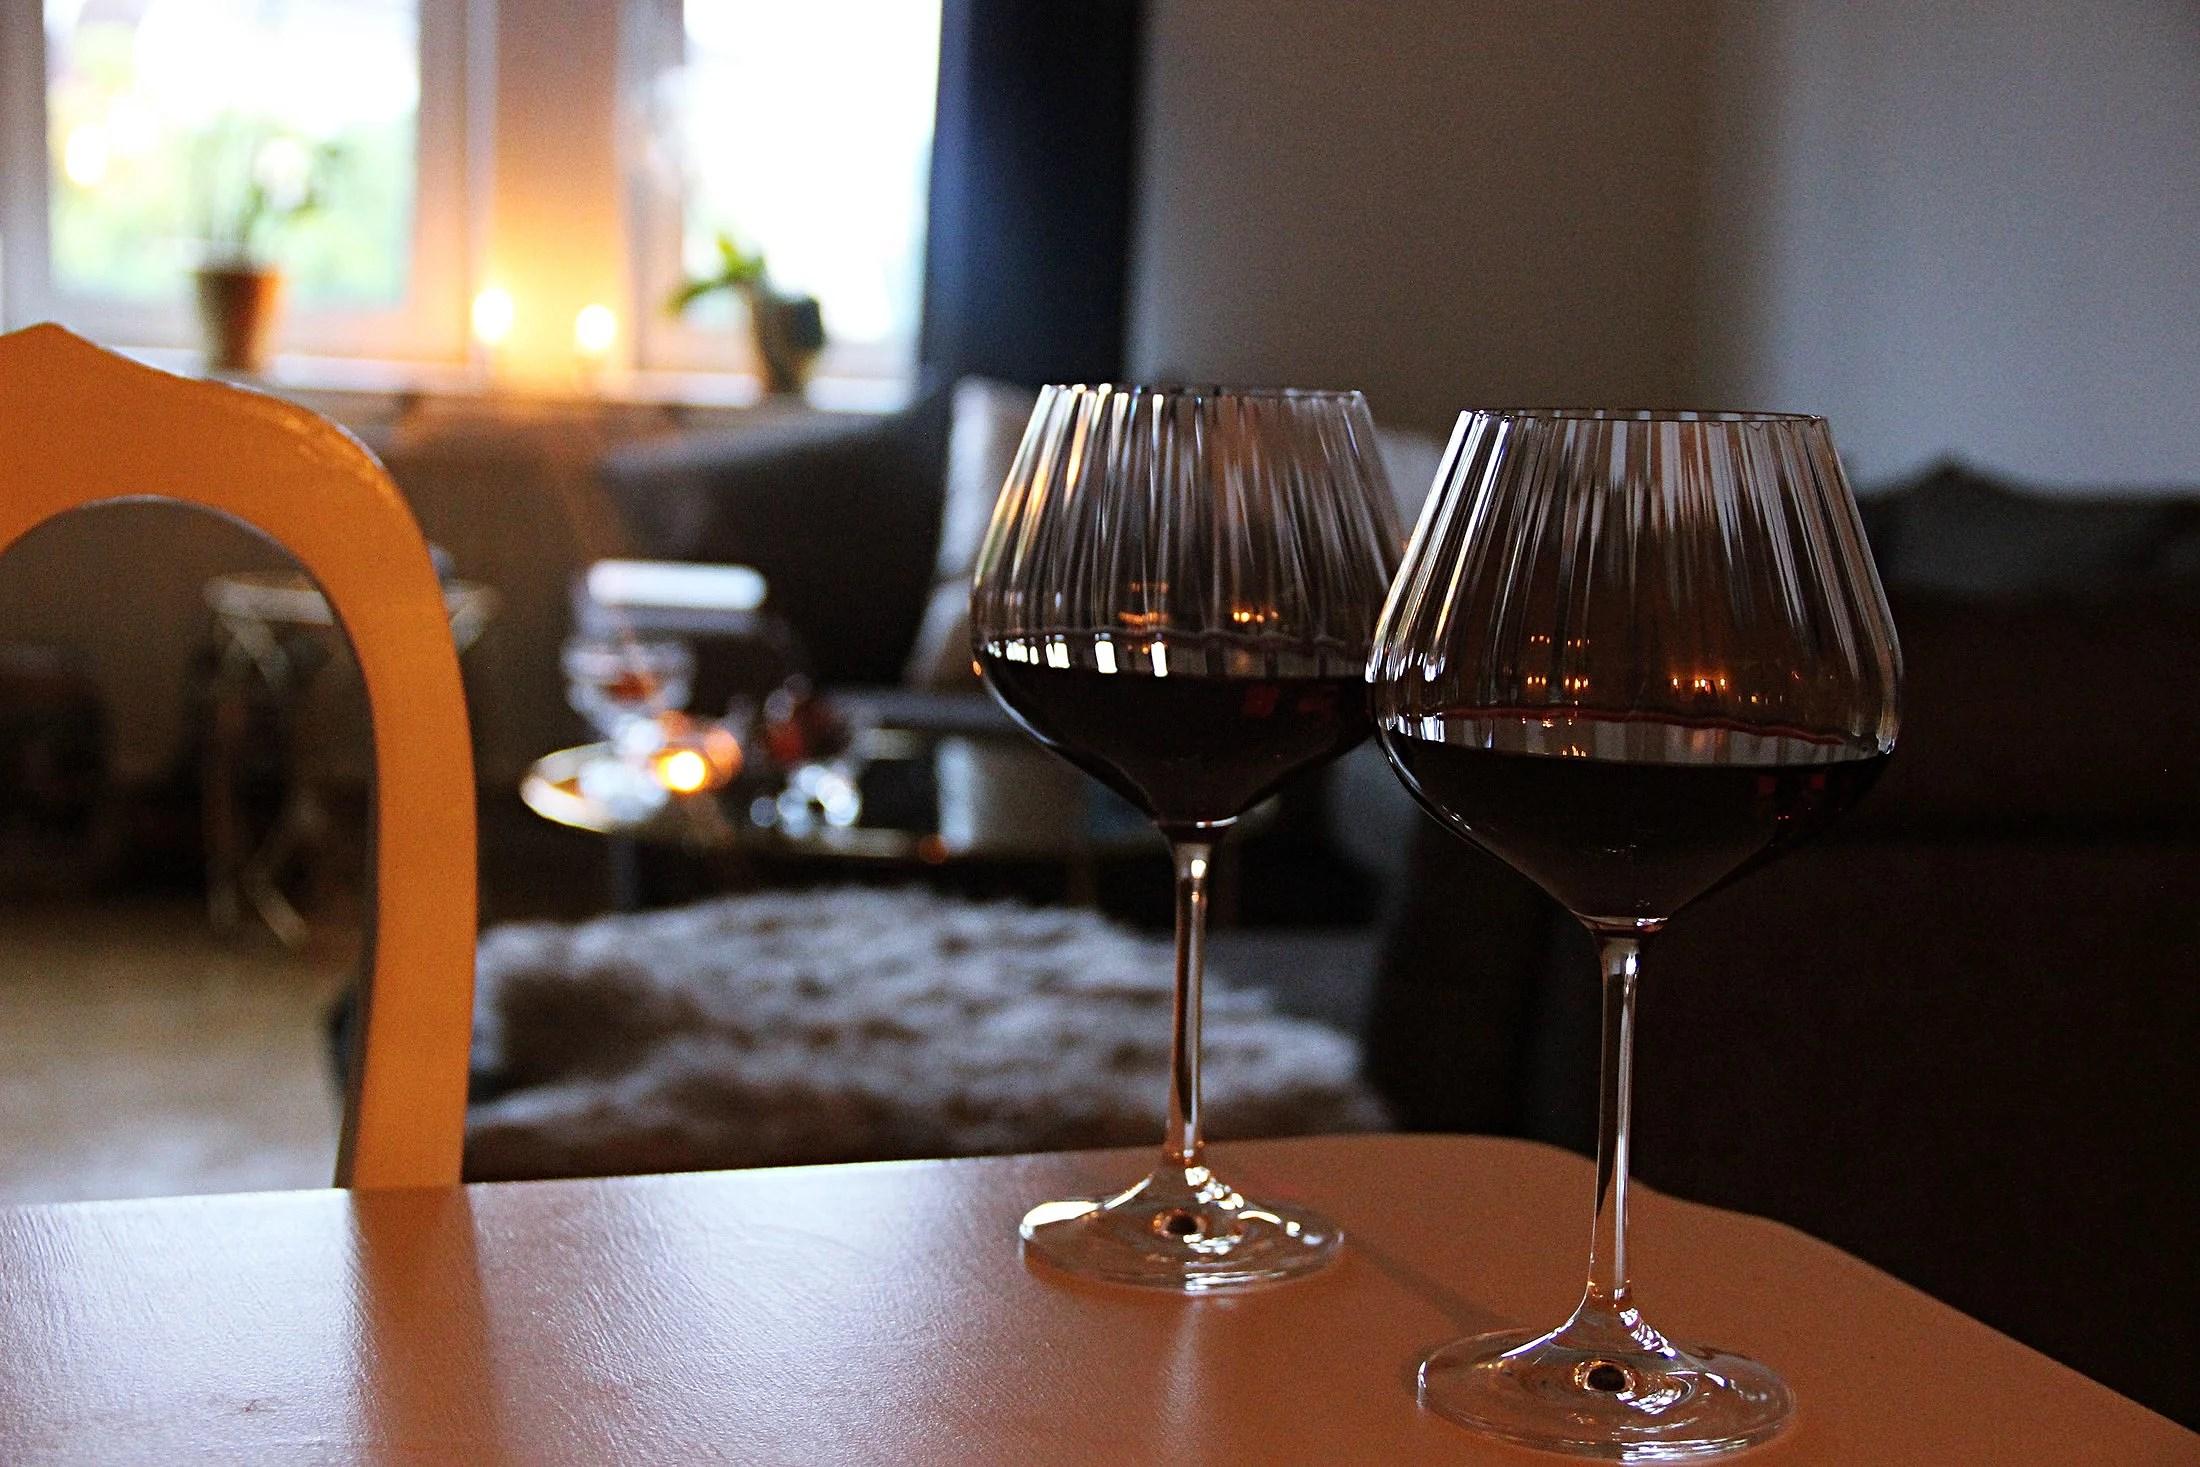 Rött vin & tända ljus